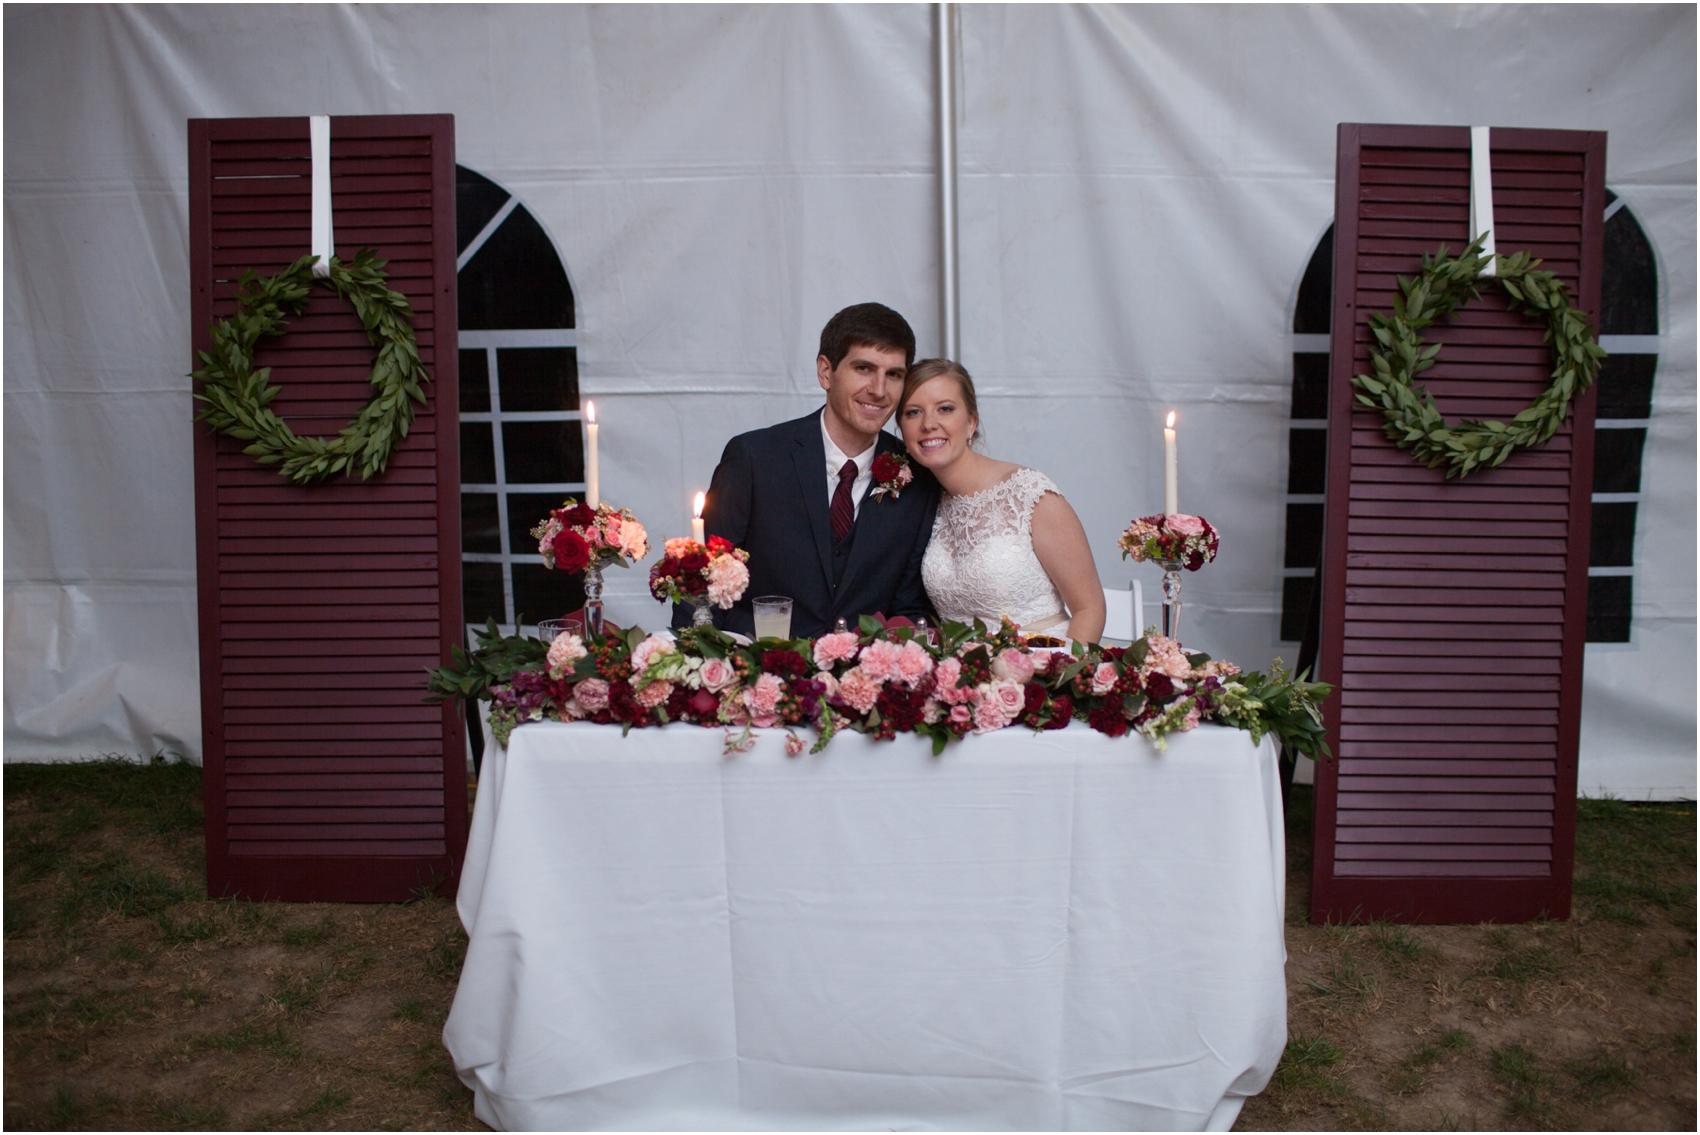 Columns-at-Six-Penny-Farm-Virginia-Fall-Wedding-9560.jpg